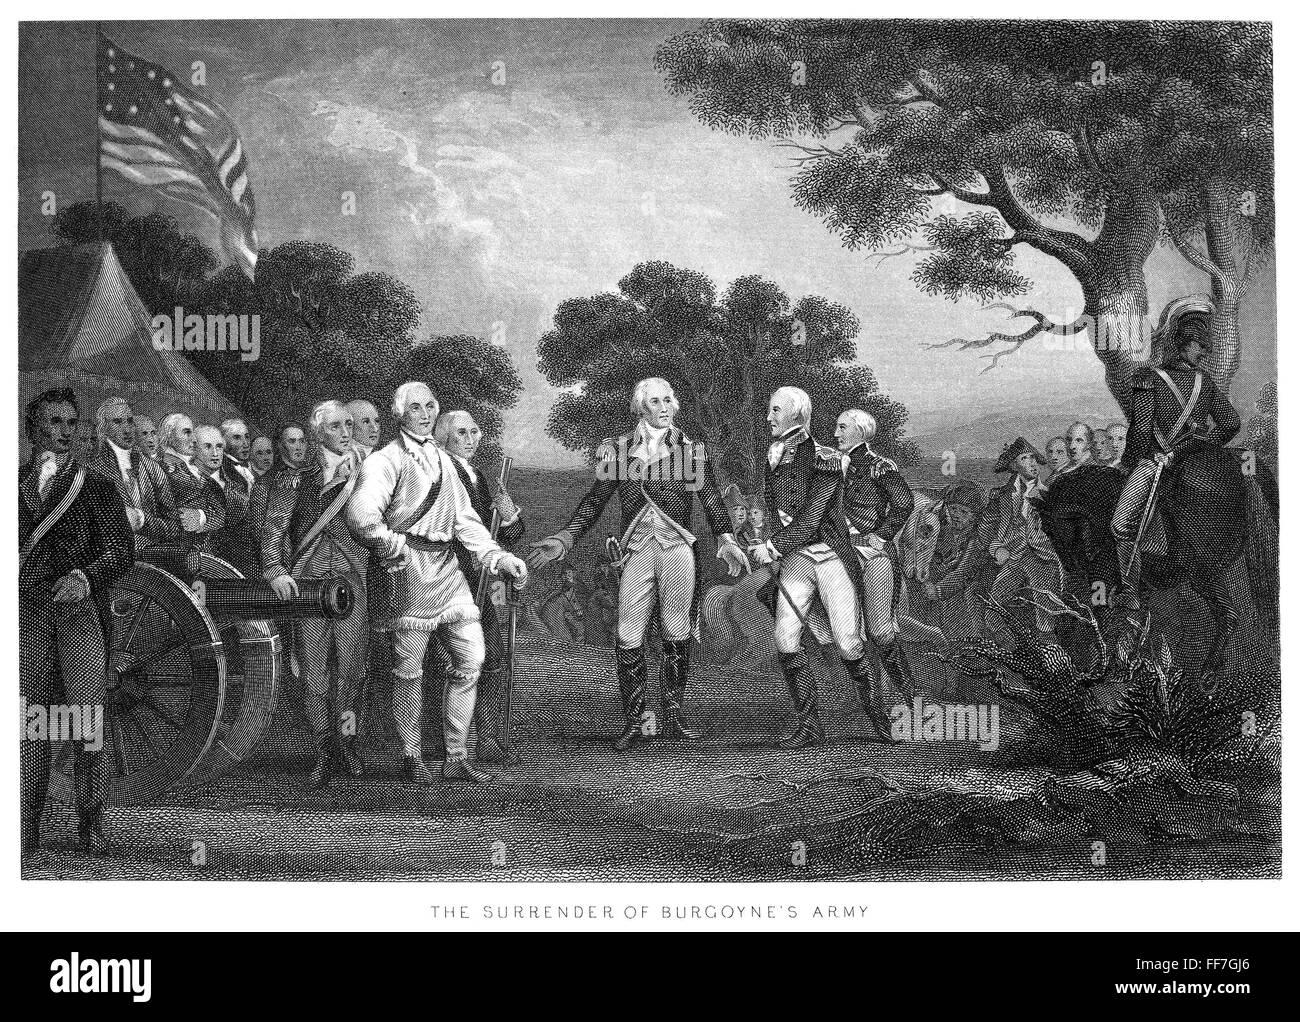 SURRENDER OF BURGOYNE AT SARATOGA GENERAL GATES SWORD AMERICAN CONTINENTAL ARMY